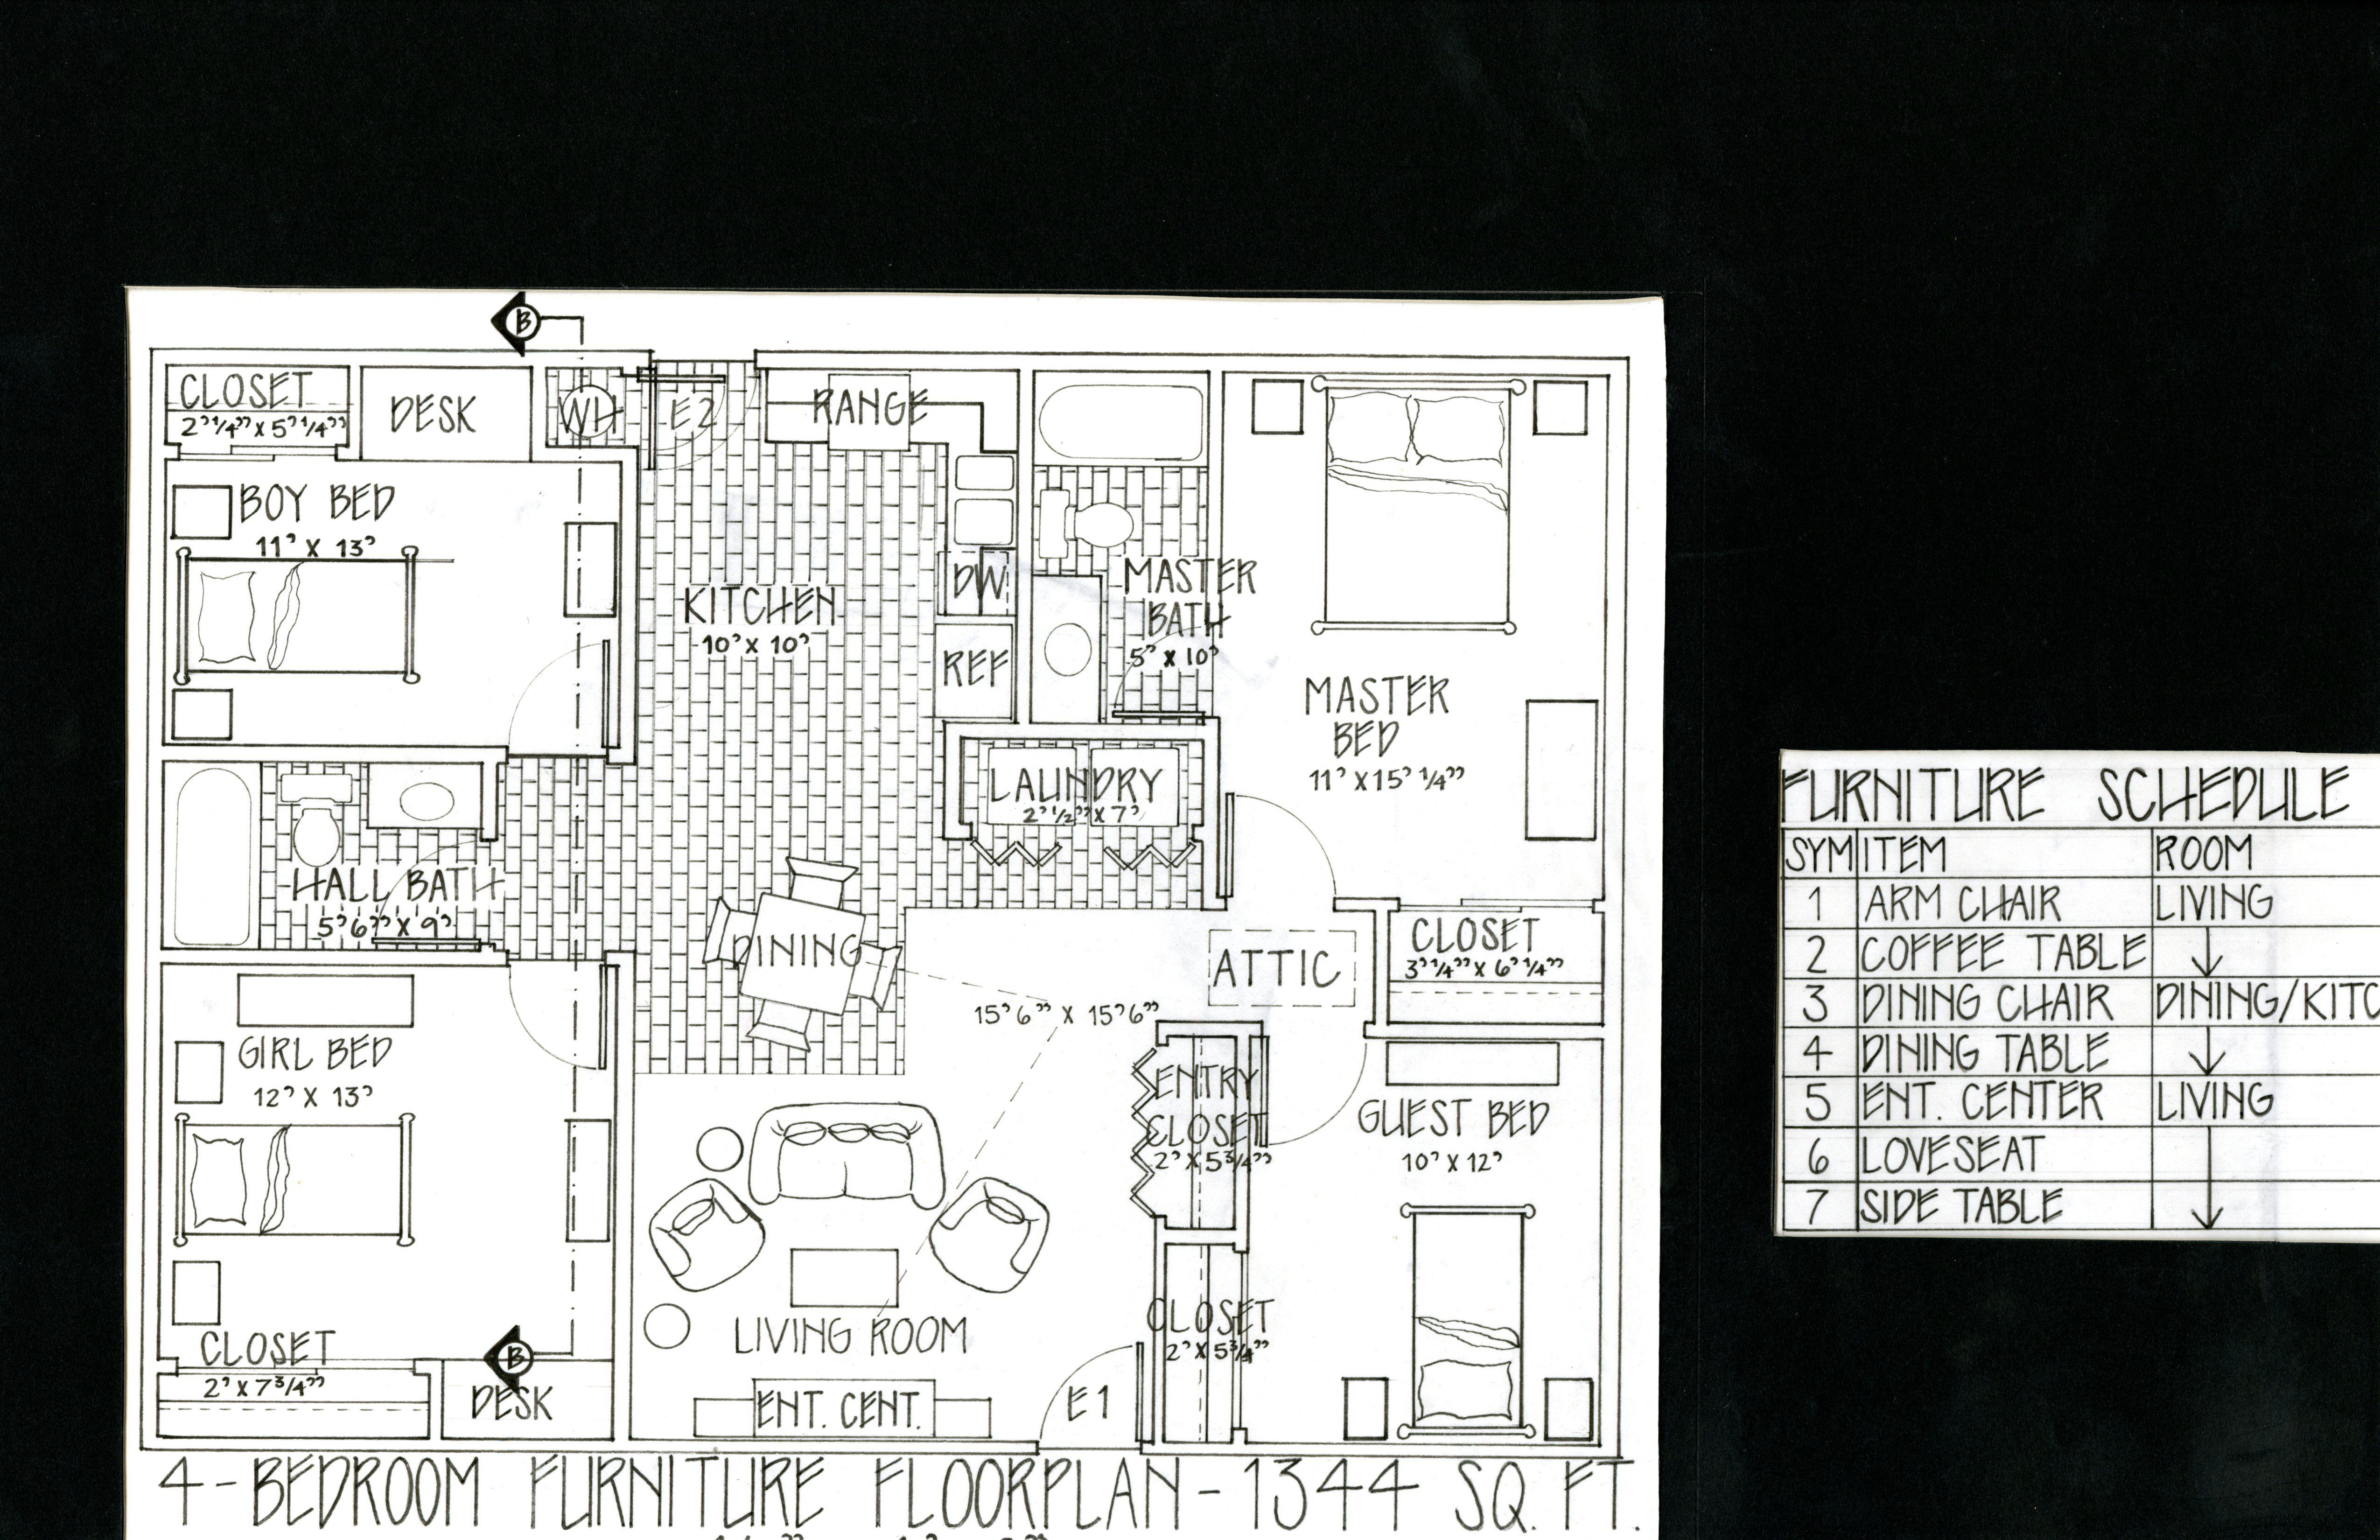 Habitat For Humanity Home Hand Drafted Floor Plan Pencil Micron Pen University Interior Design Floor Plans Habitat For Humanity